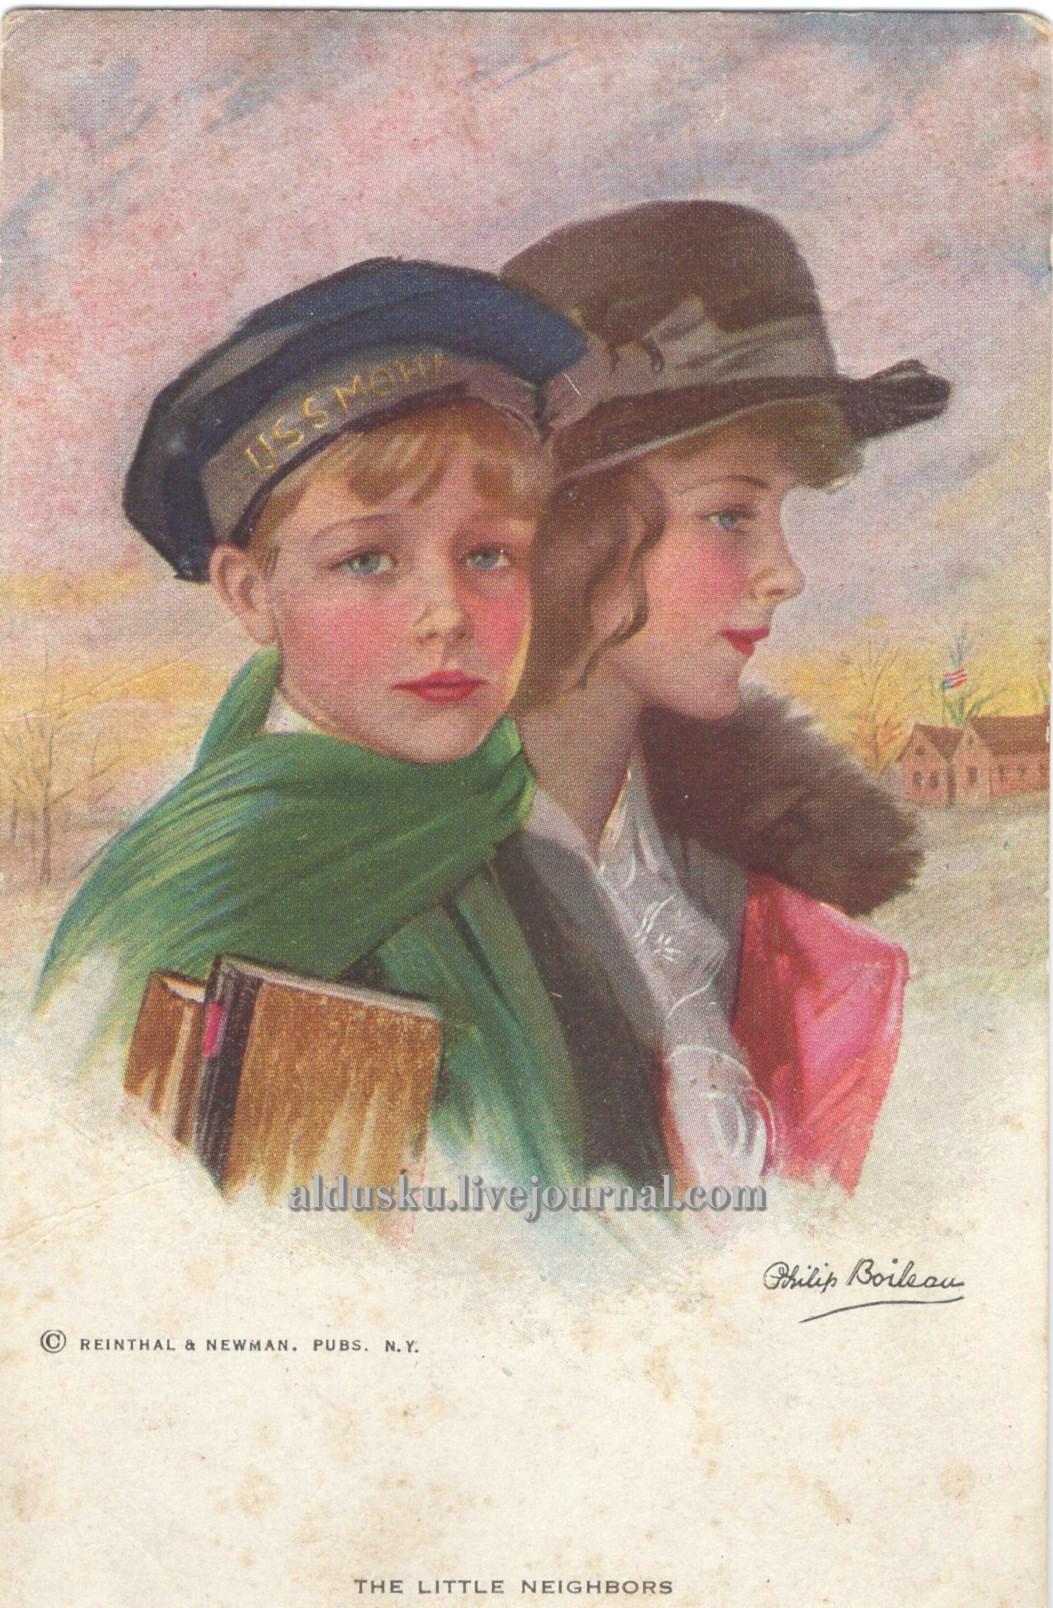 Художник: Филипп Бойло (Philip Boileau 1863-1917); Издательство: Reinthal & Newman, Pubs., N.Y., Рейнзал и Ньюман Америка. Сзади аббревиатура RN и №828